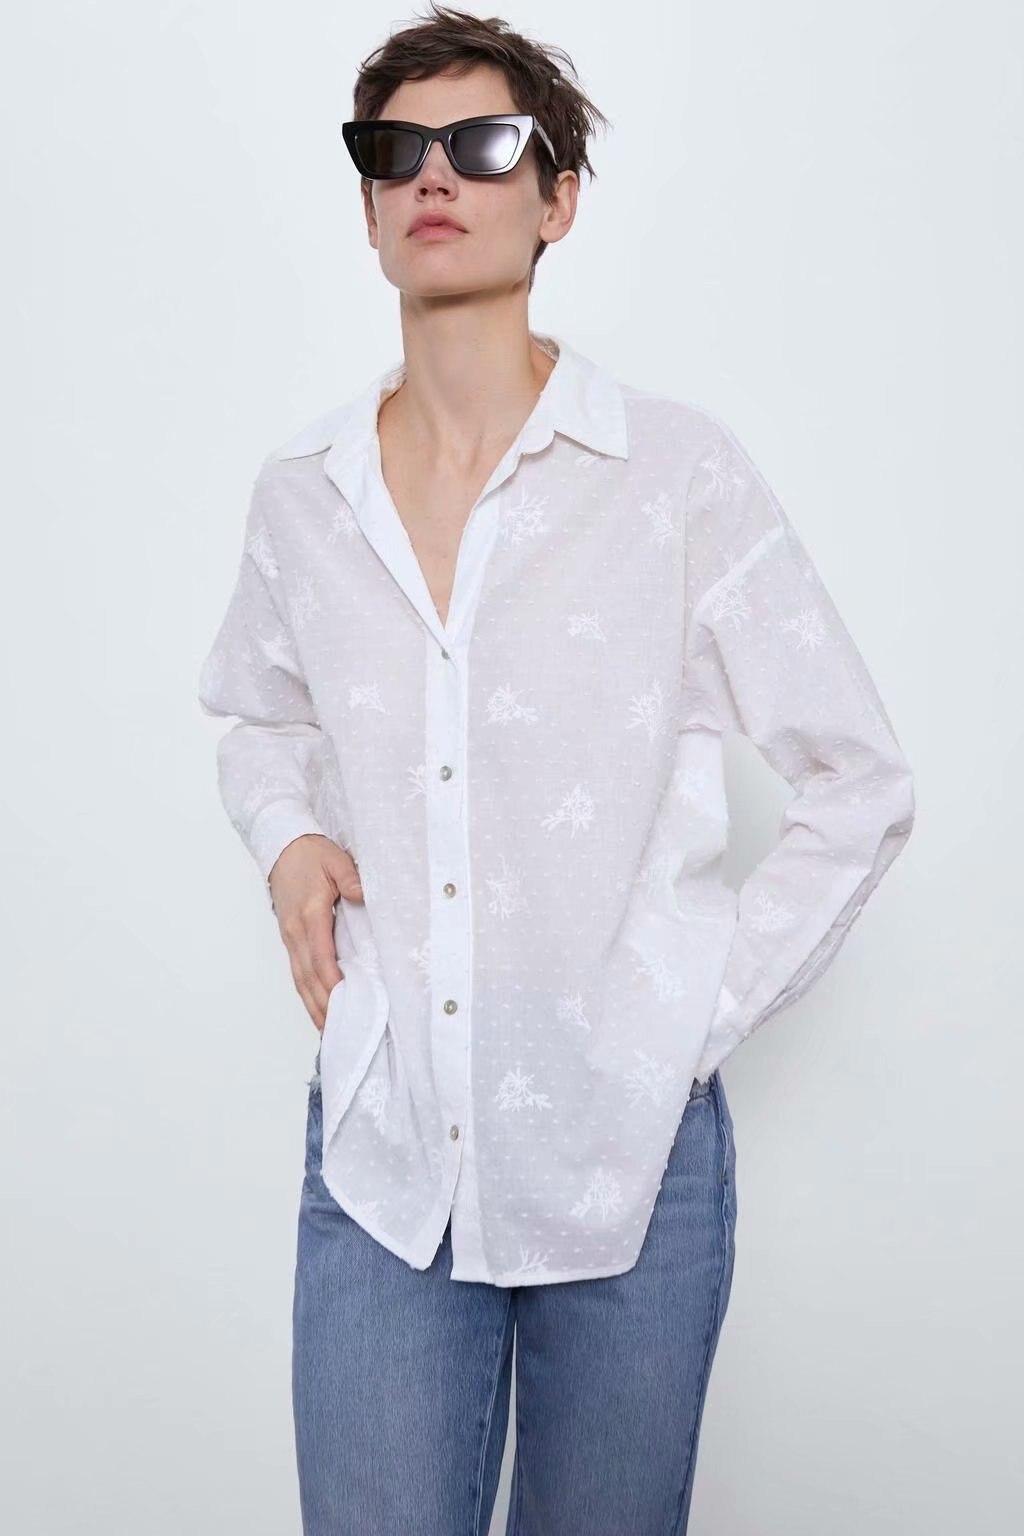 2020 New Spring Summer New Style European Cotton Loose Fit Female Blouse Shirt Zaraing Vadiming Sheining Women White Shirt